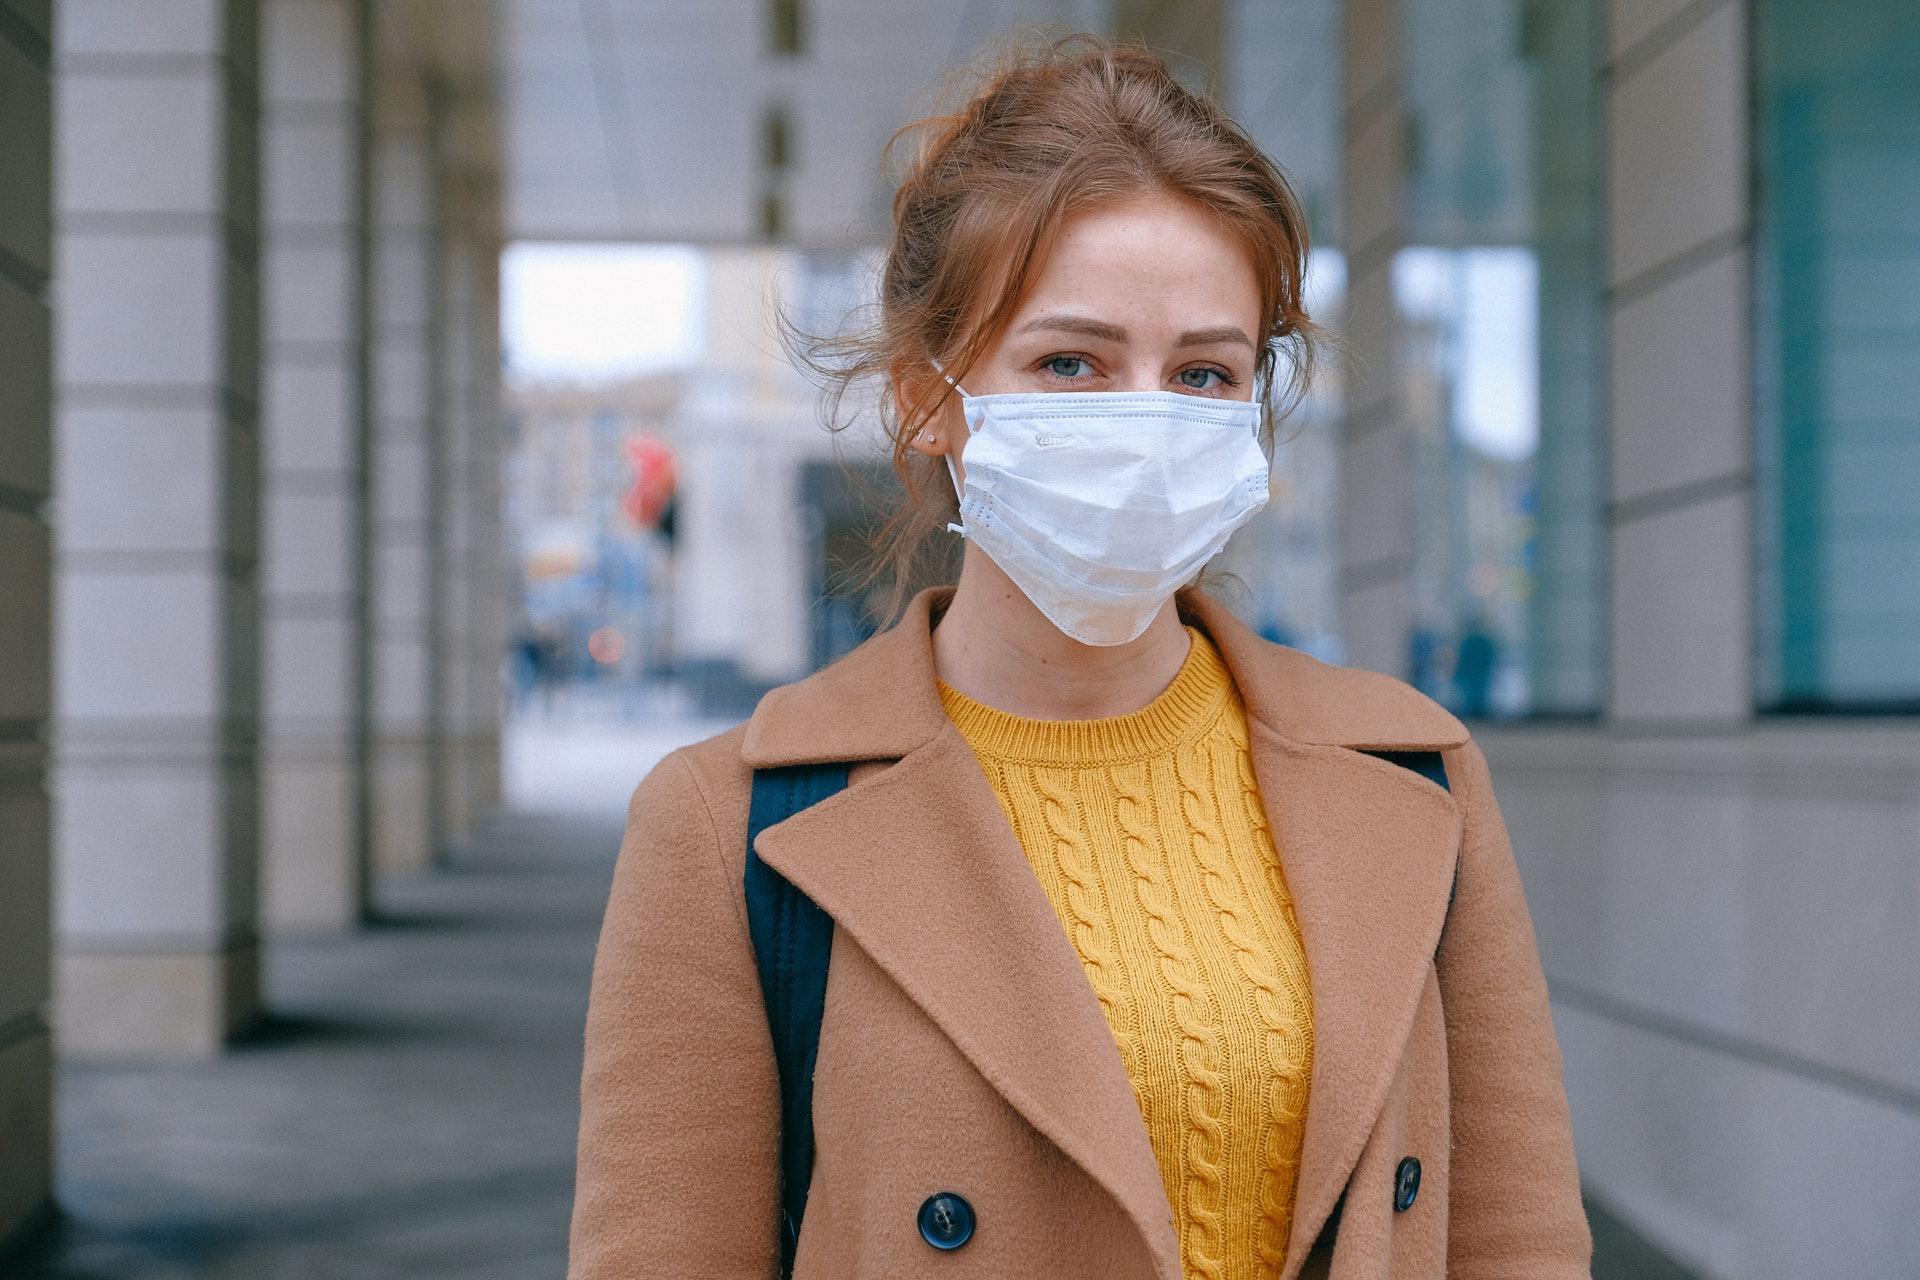 Woman outside wearing a face mask